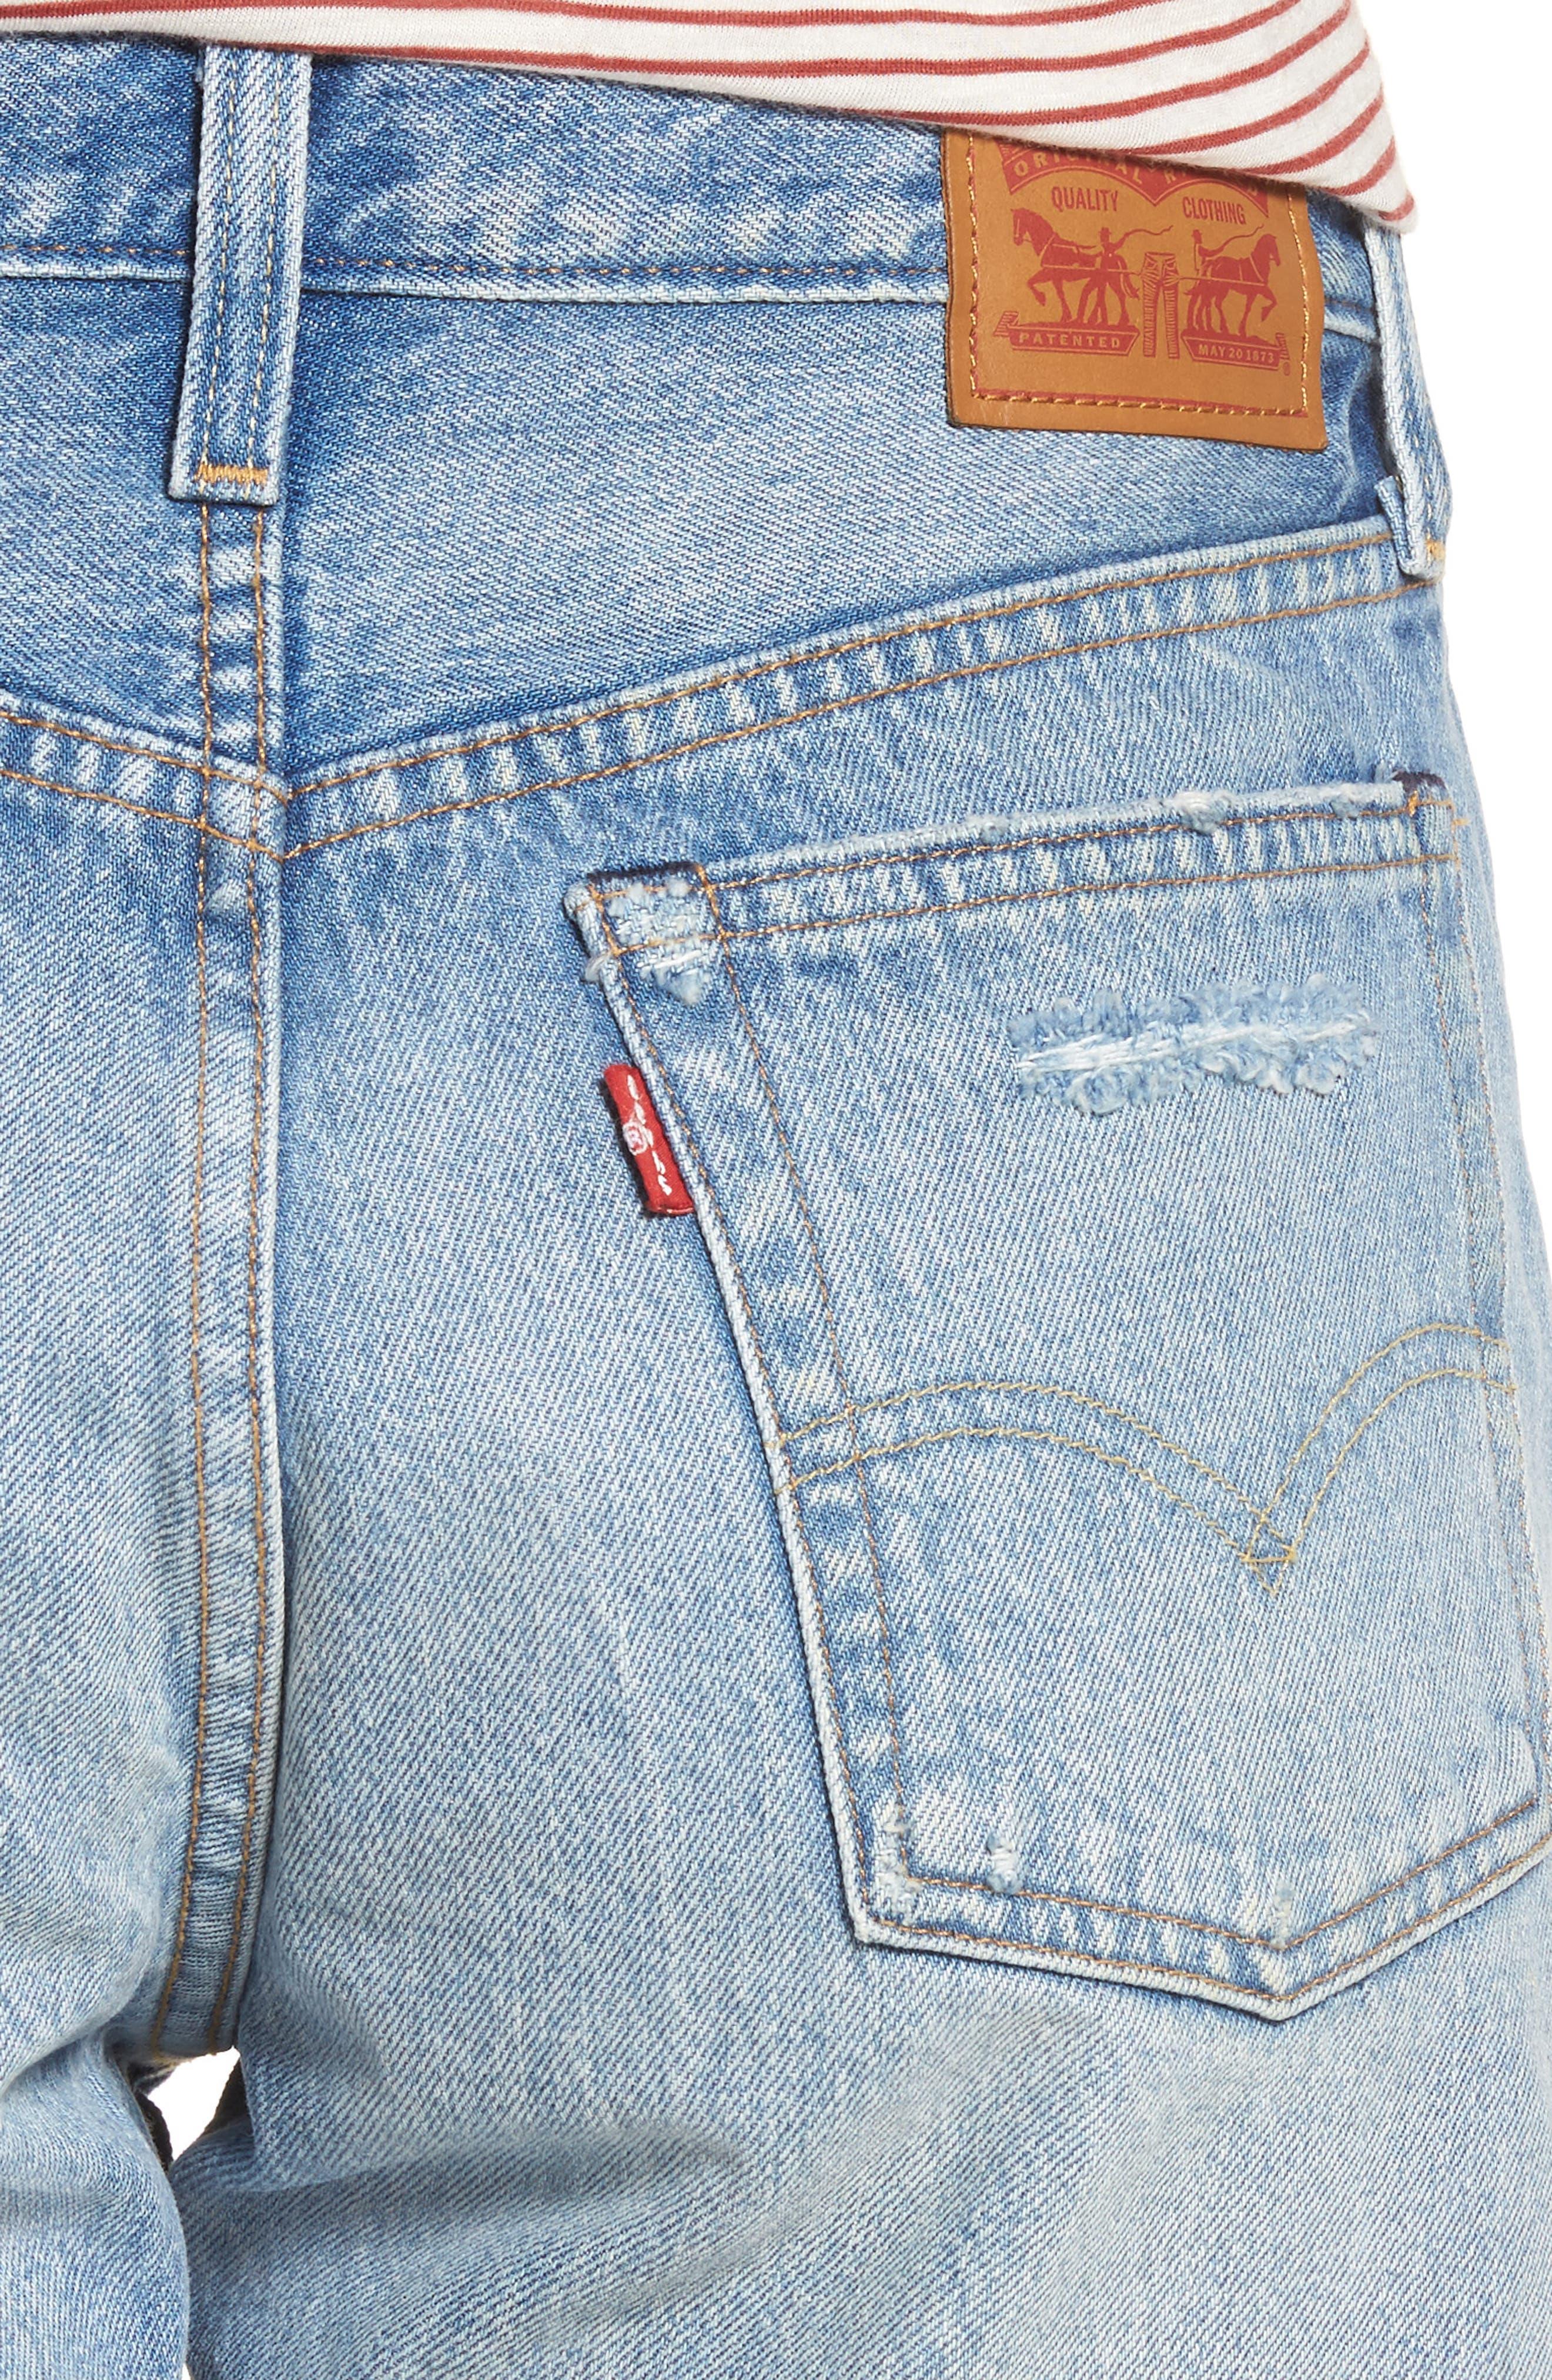 Indie Shredded Cutoff Denim Shorts,                             Alternate thumbnail 4, color,                             450